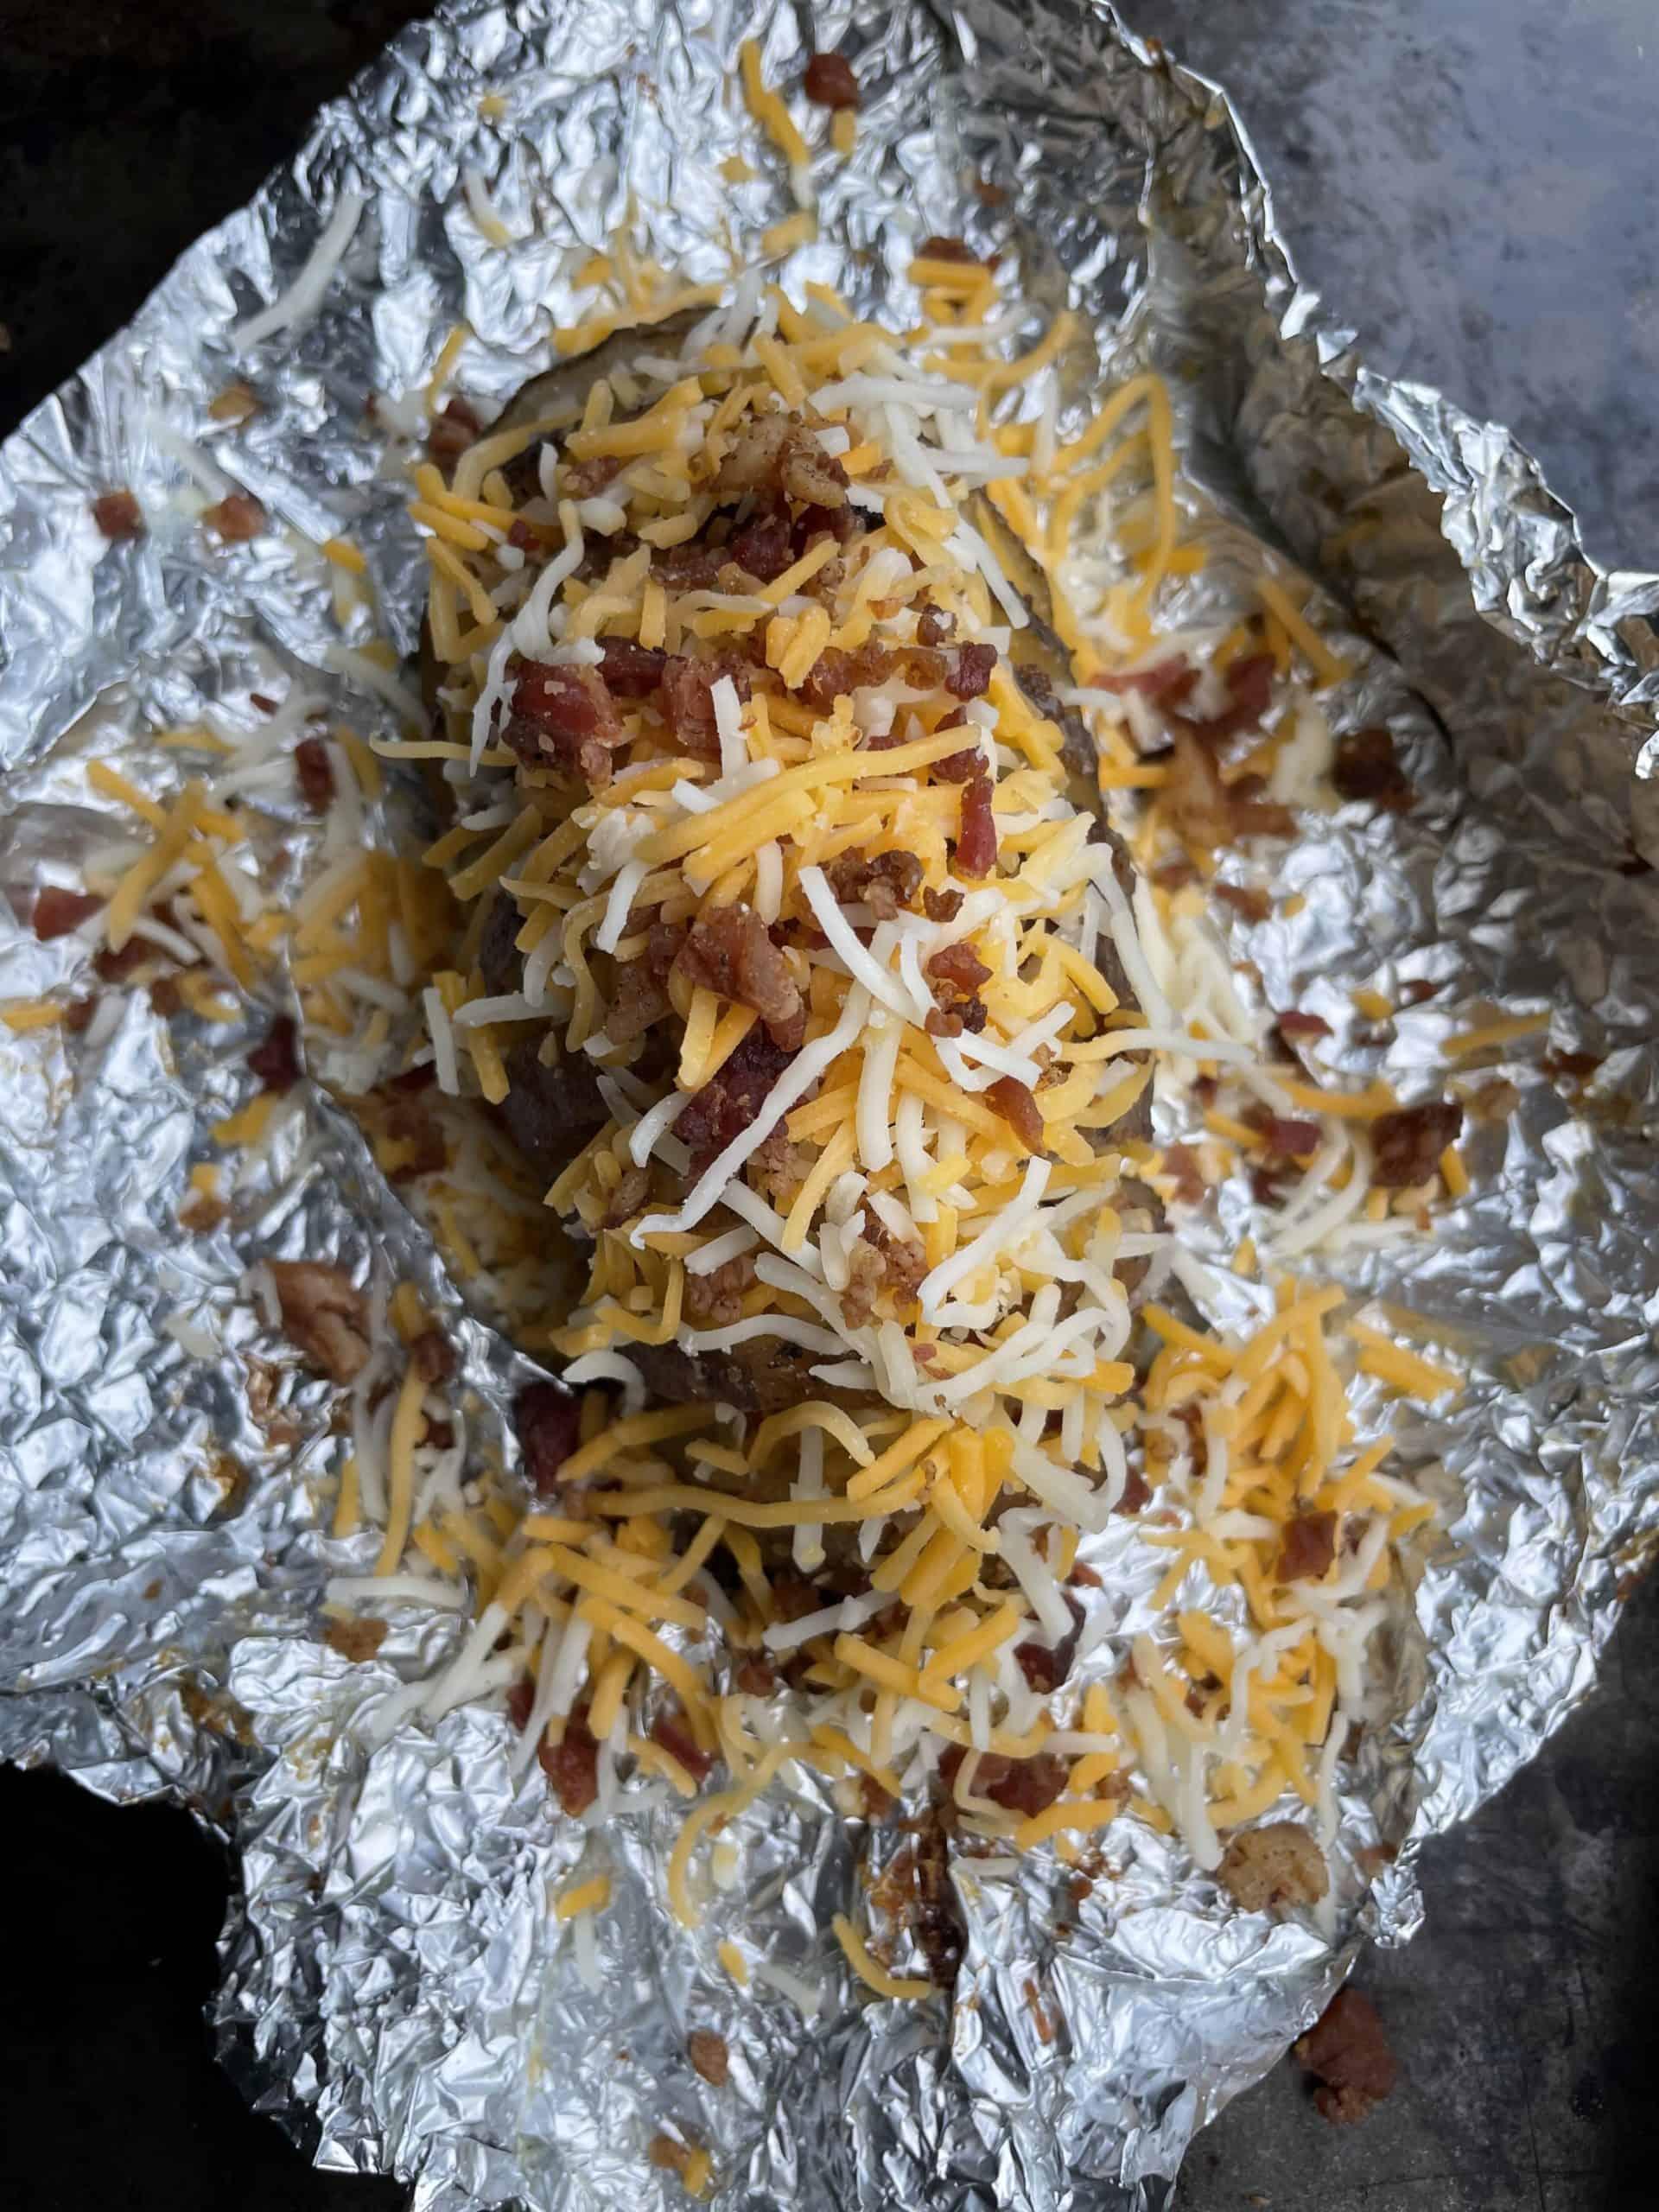 Sprinkle Shredded Cheese  On-top Of Sliced Potato